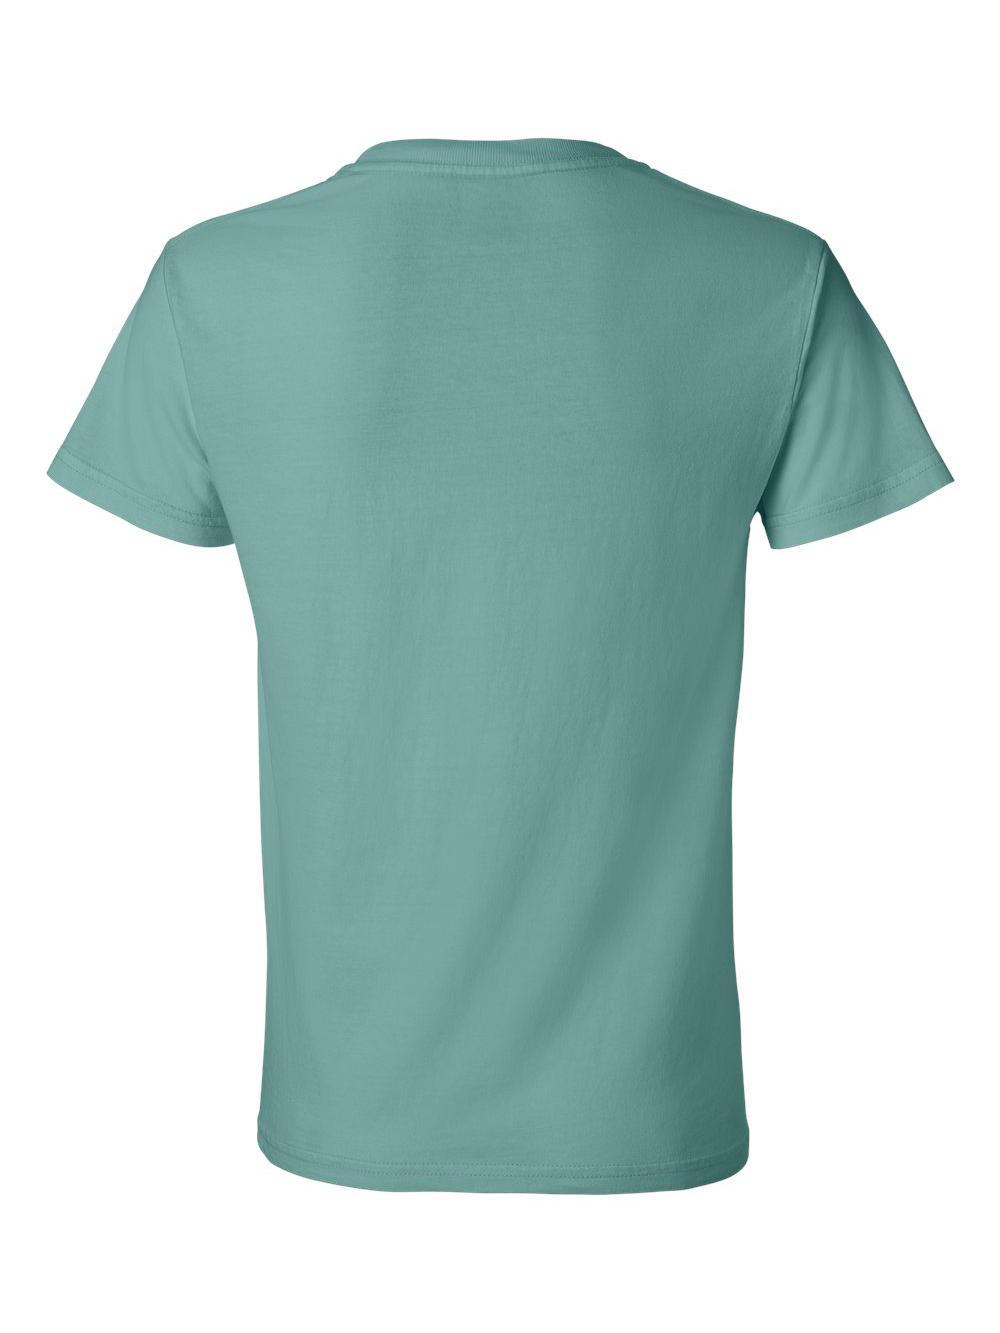 Comfort-Colors-Pigment-Dyed-Ringspun-Women-039-s-Short-Sleeve-T-Shirt-3333 thumbnail 26